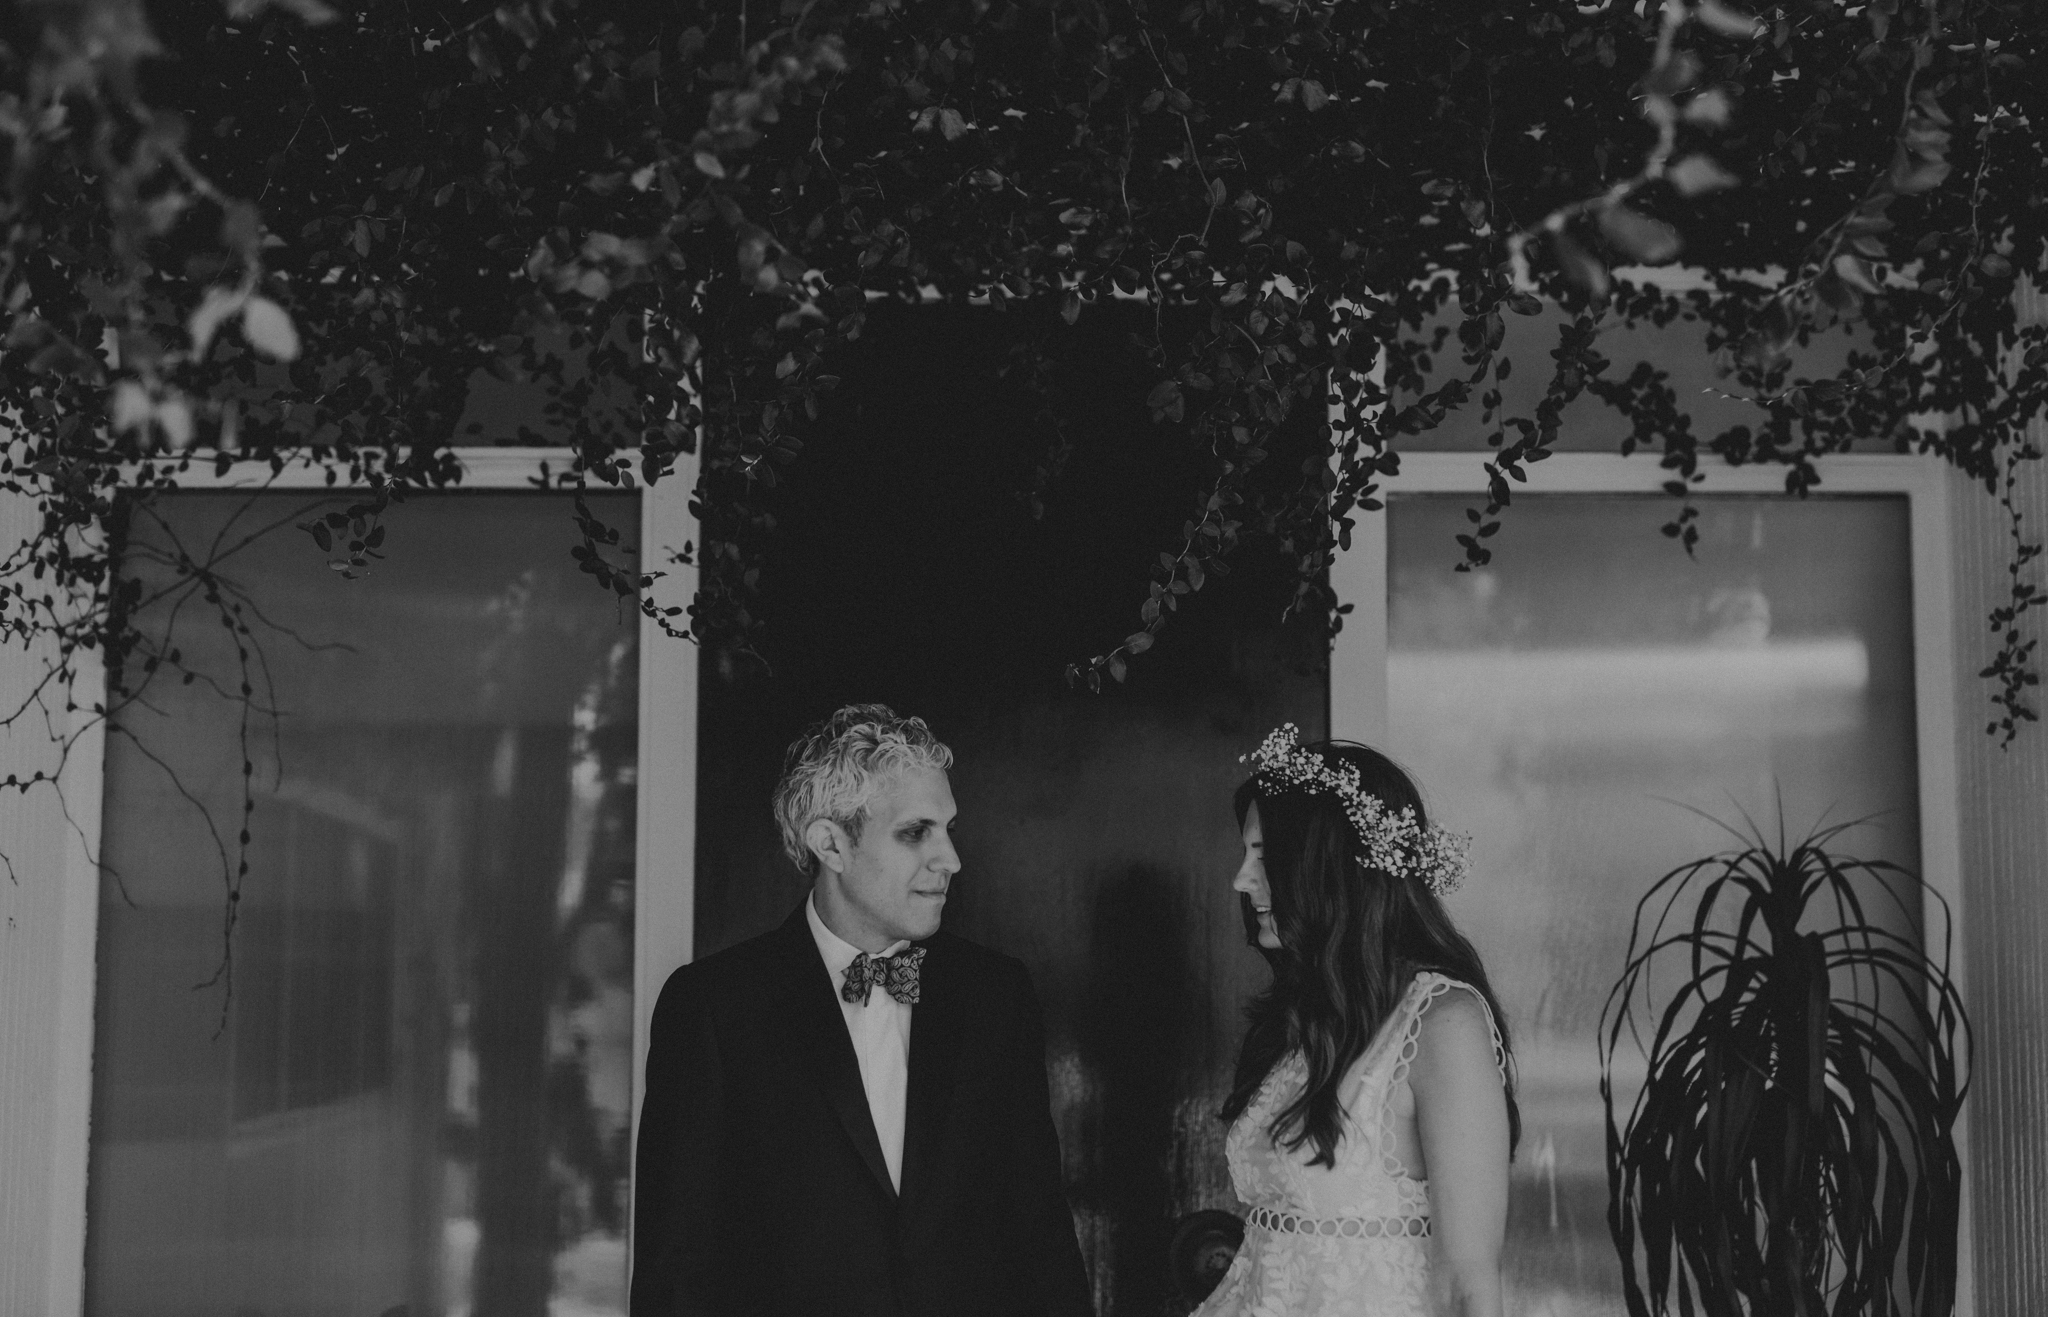 Isaiah + Taylor Photography - Private Estate Backyard Wedding - Beverly Hills - Los Angeles Wedding Photographer - 18.jpg